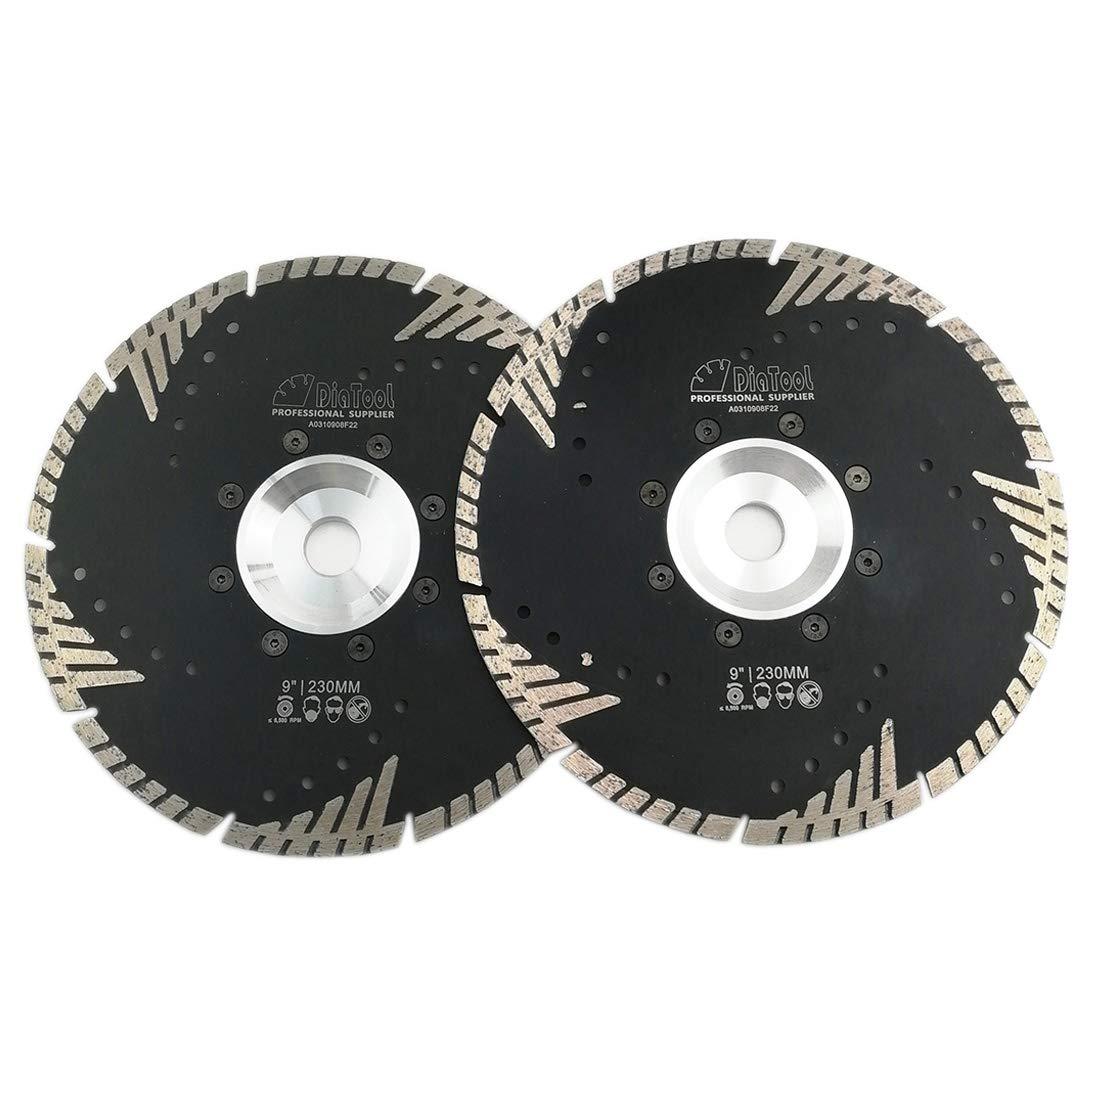 7 Blastrac CG-712ETB Concrete Turbo Diamond Cup Wheel 12 Seg Economy Blade